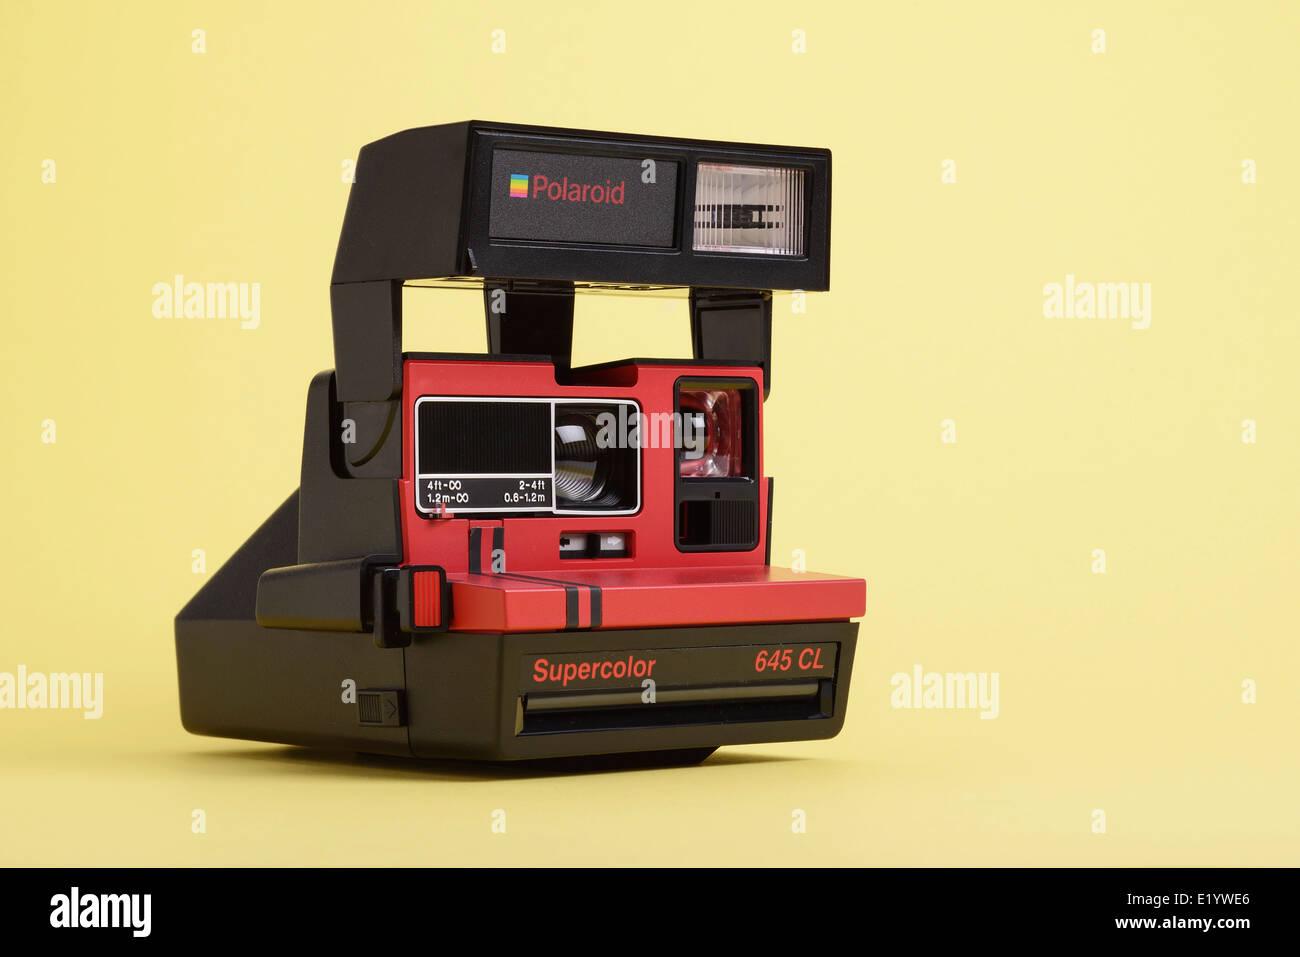 Old vintage retro Polaroid film camera - Stock Image